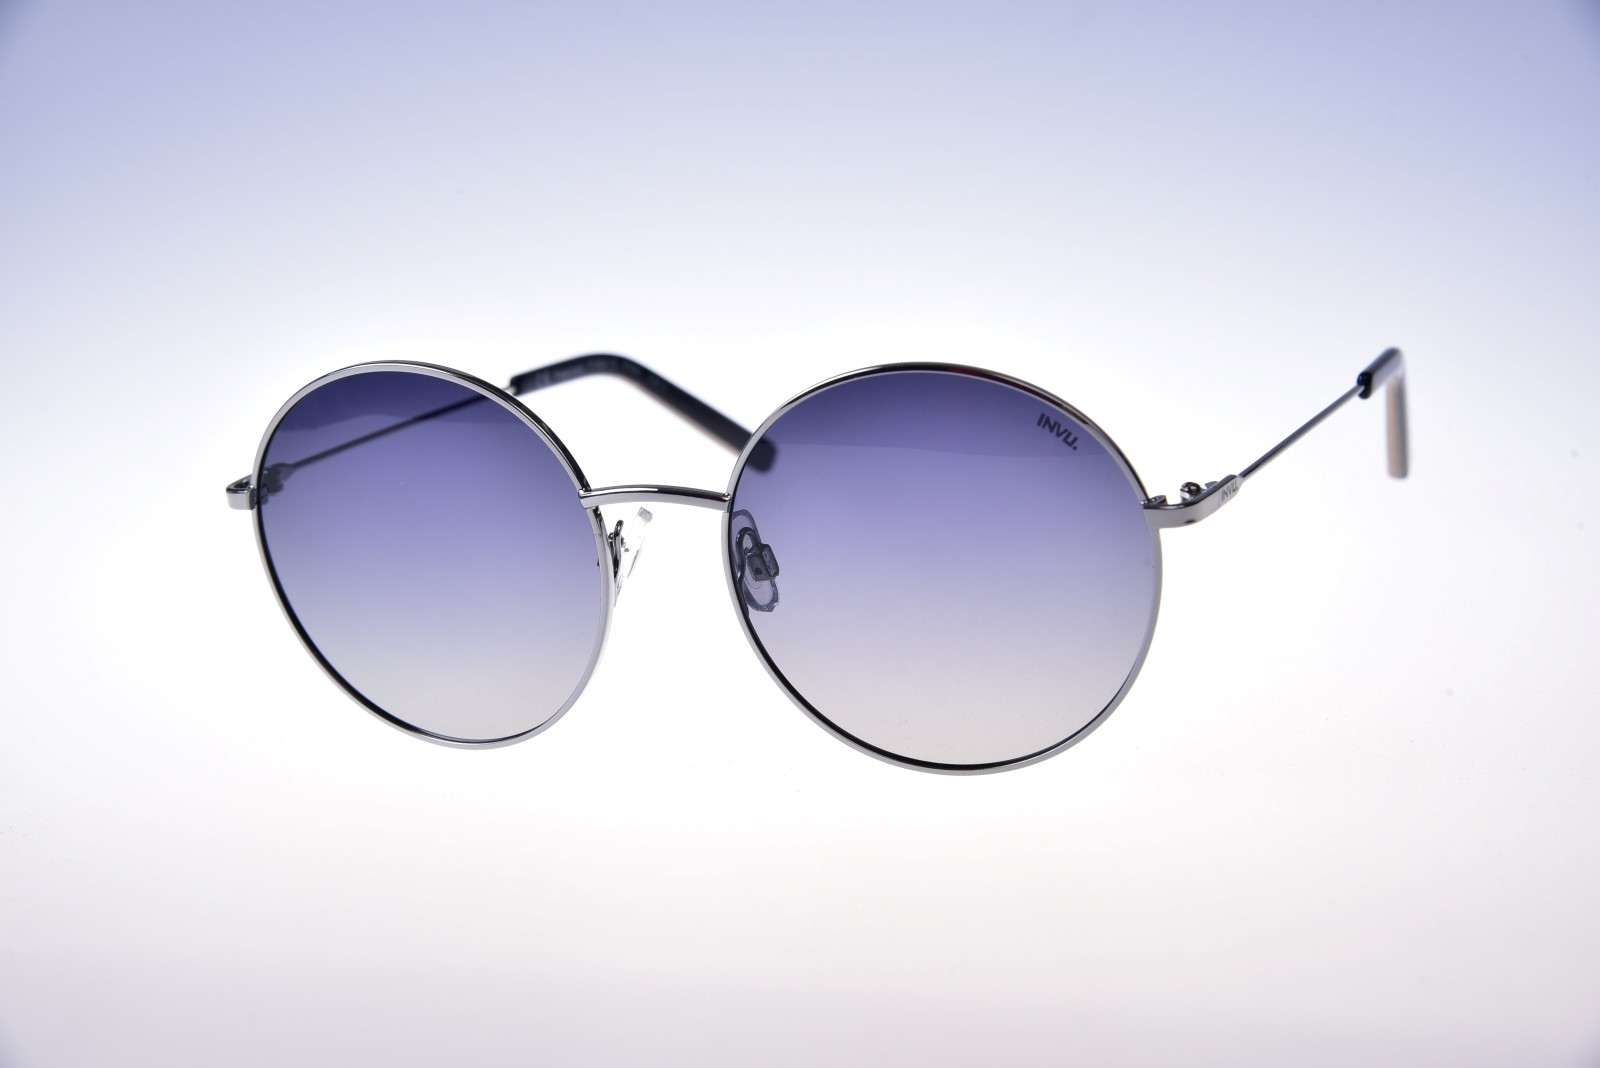 INVU. Trend T1904D - Dámske slnečné okuliare